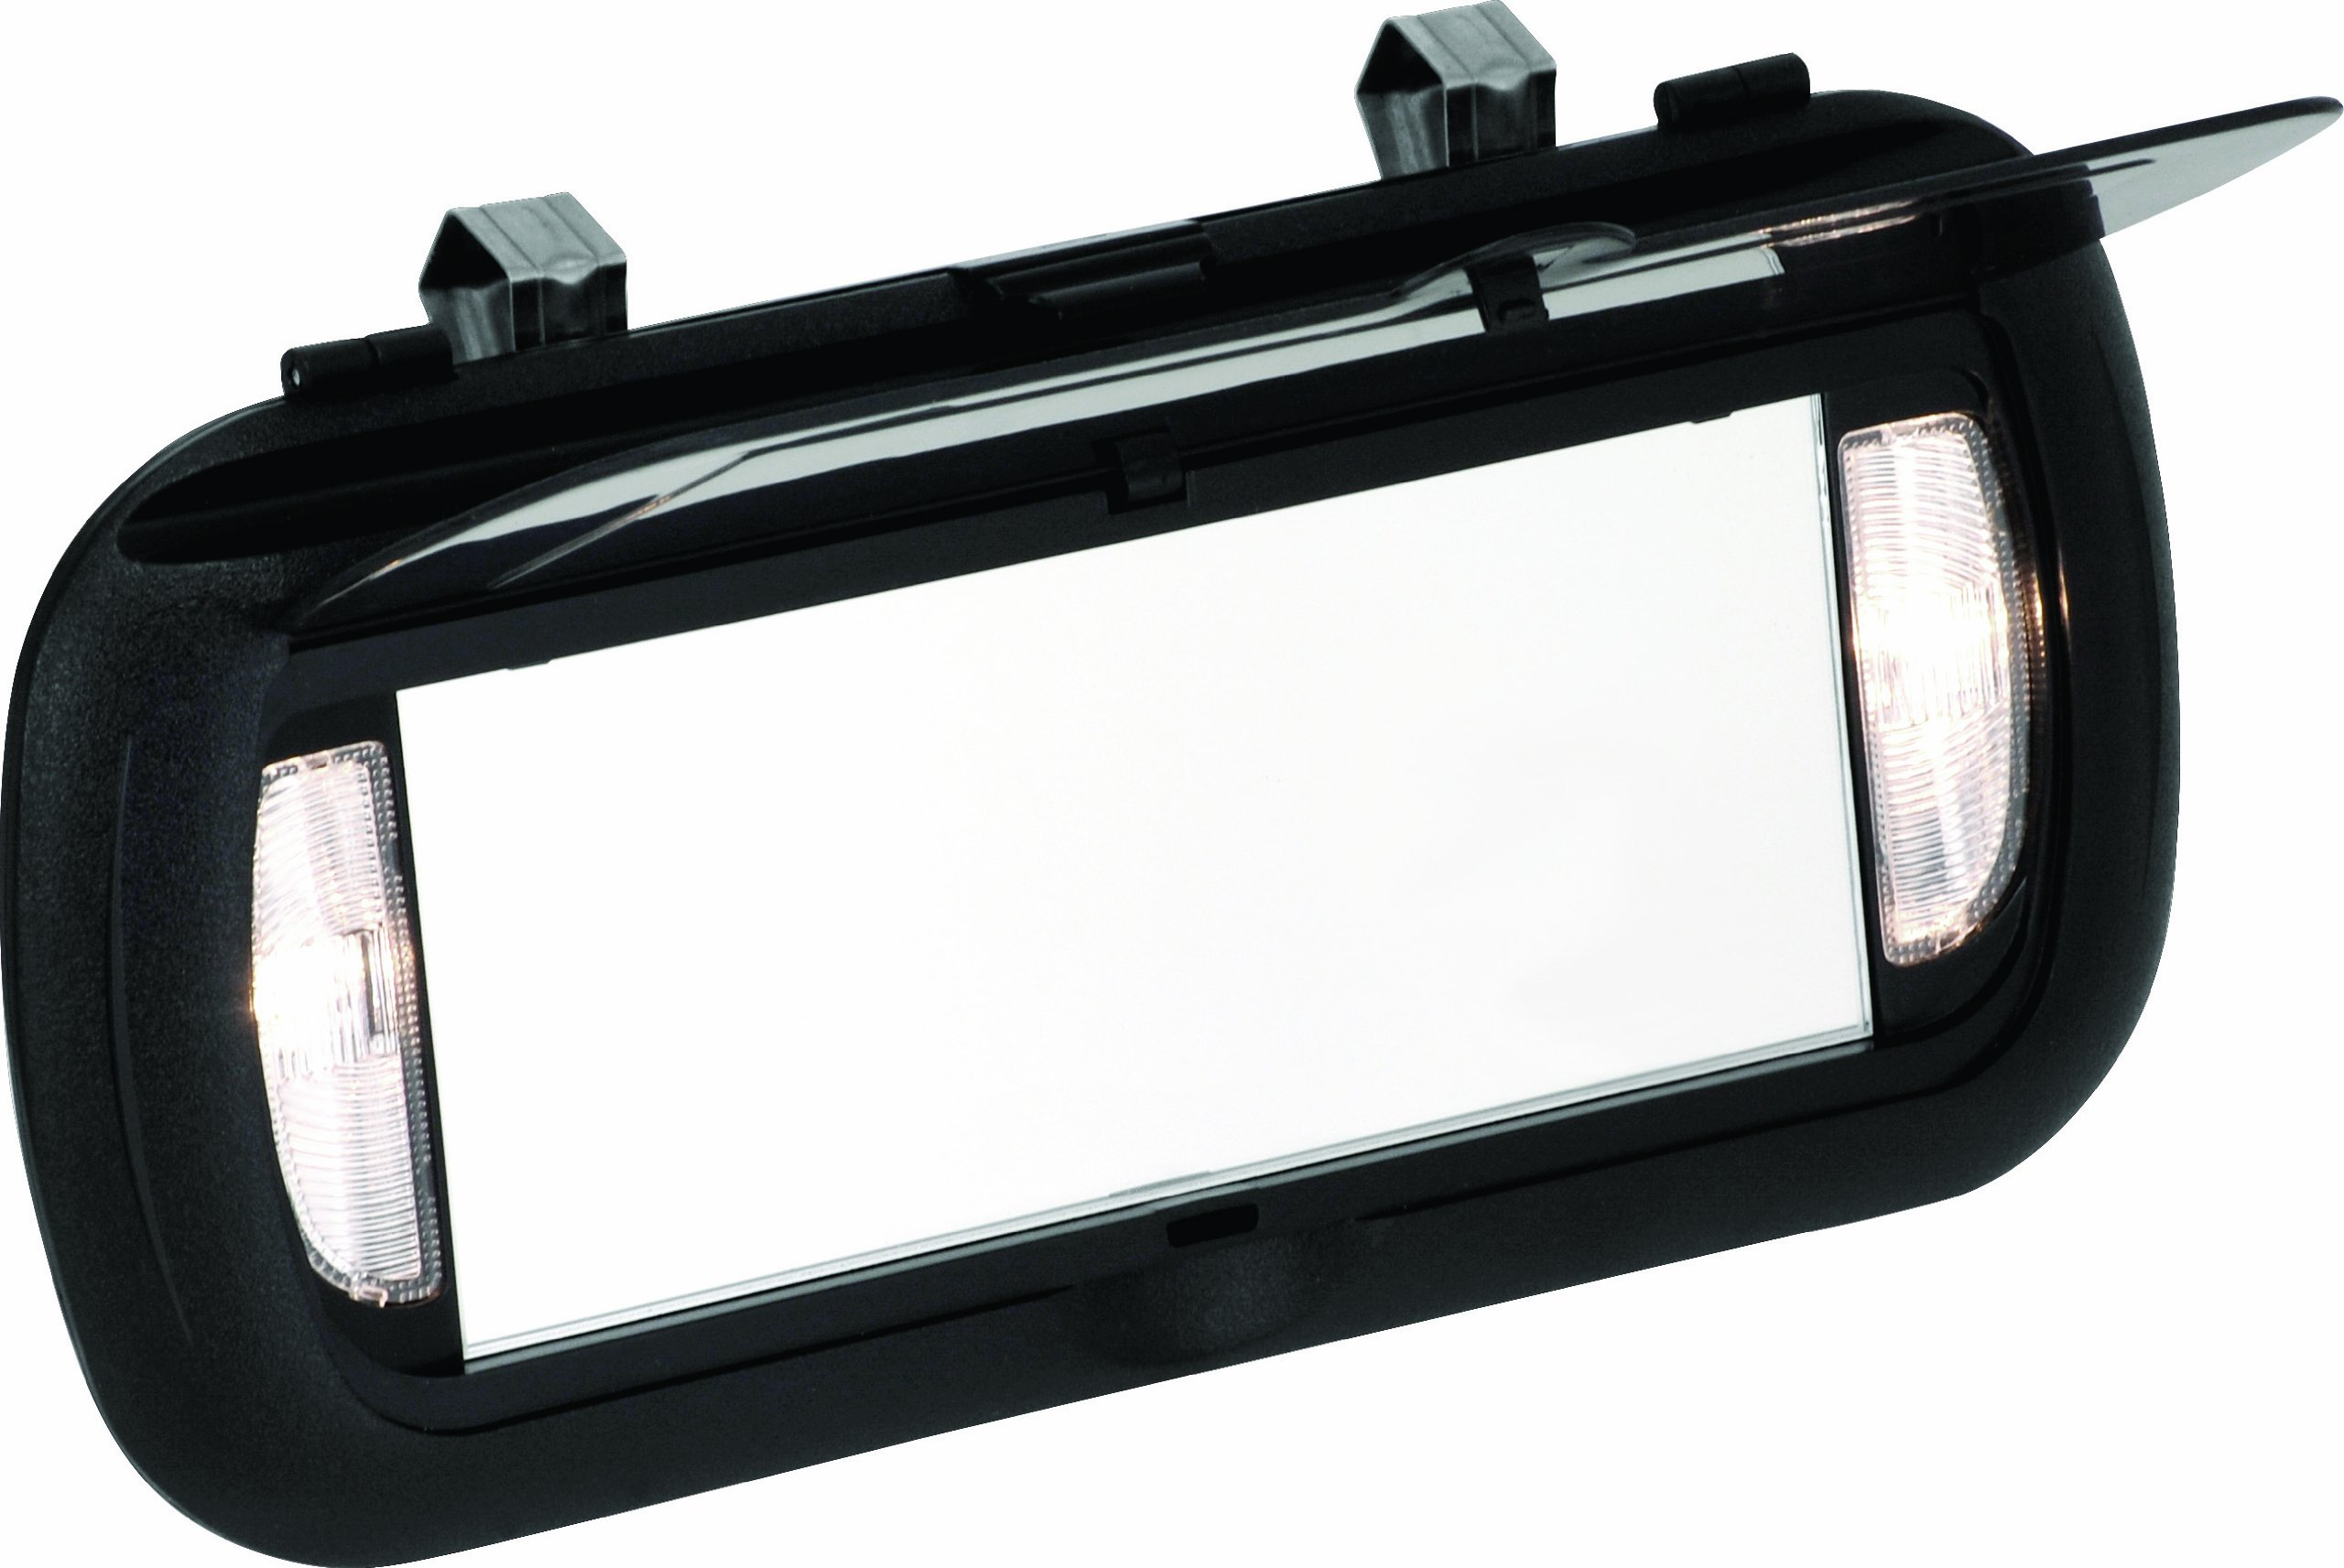 Bell automotive 22 1 00449 8 large lighted visor mirror ebay for Mirror visor